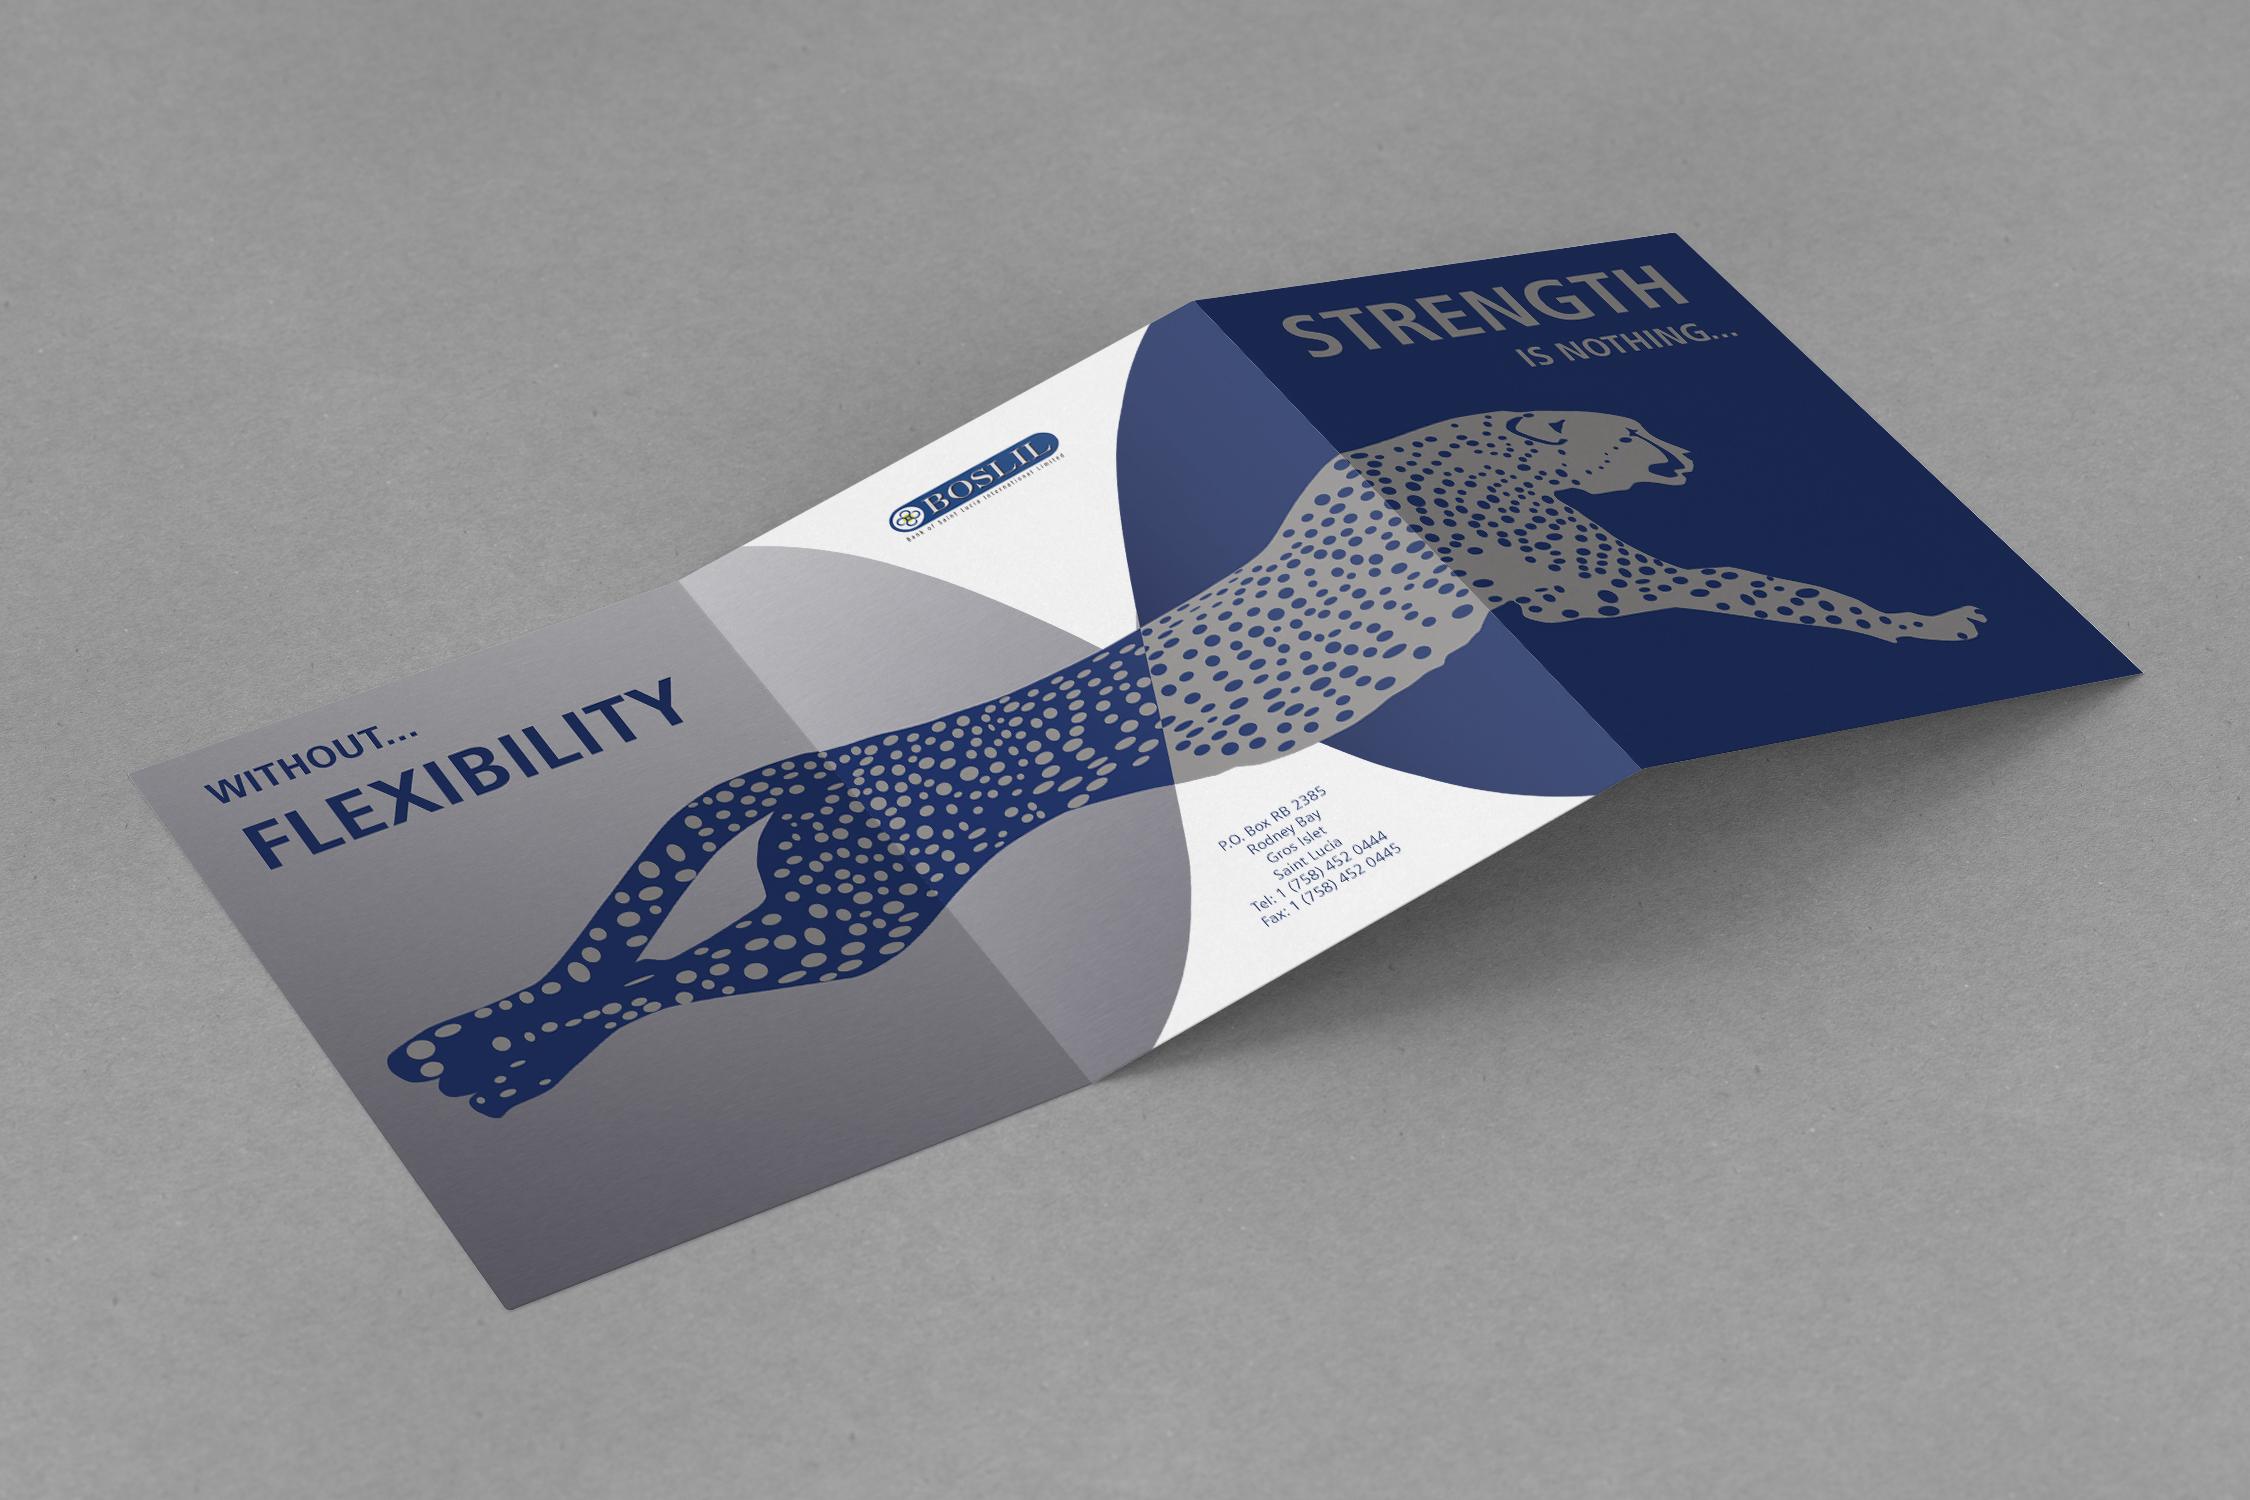 NSJ Creative - Freelance graphic design and illustration - Leaflet ...